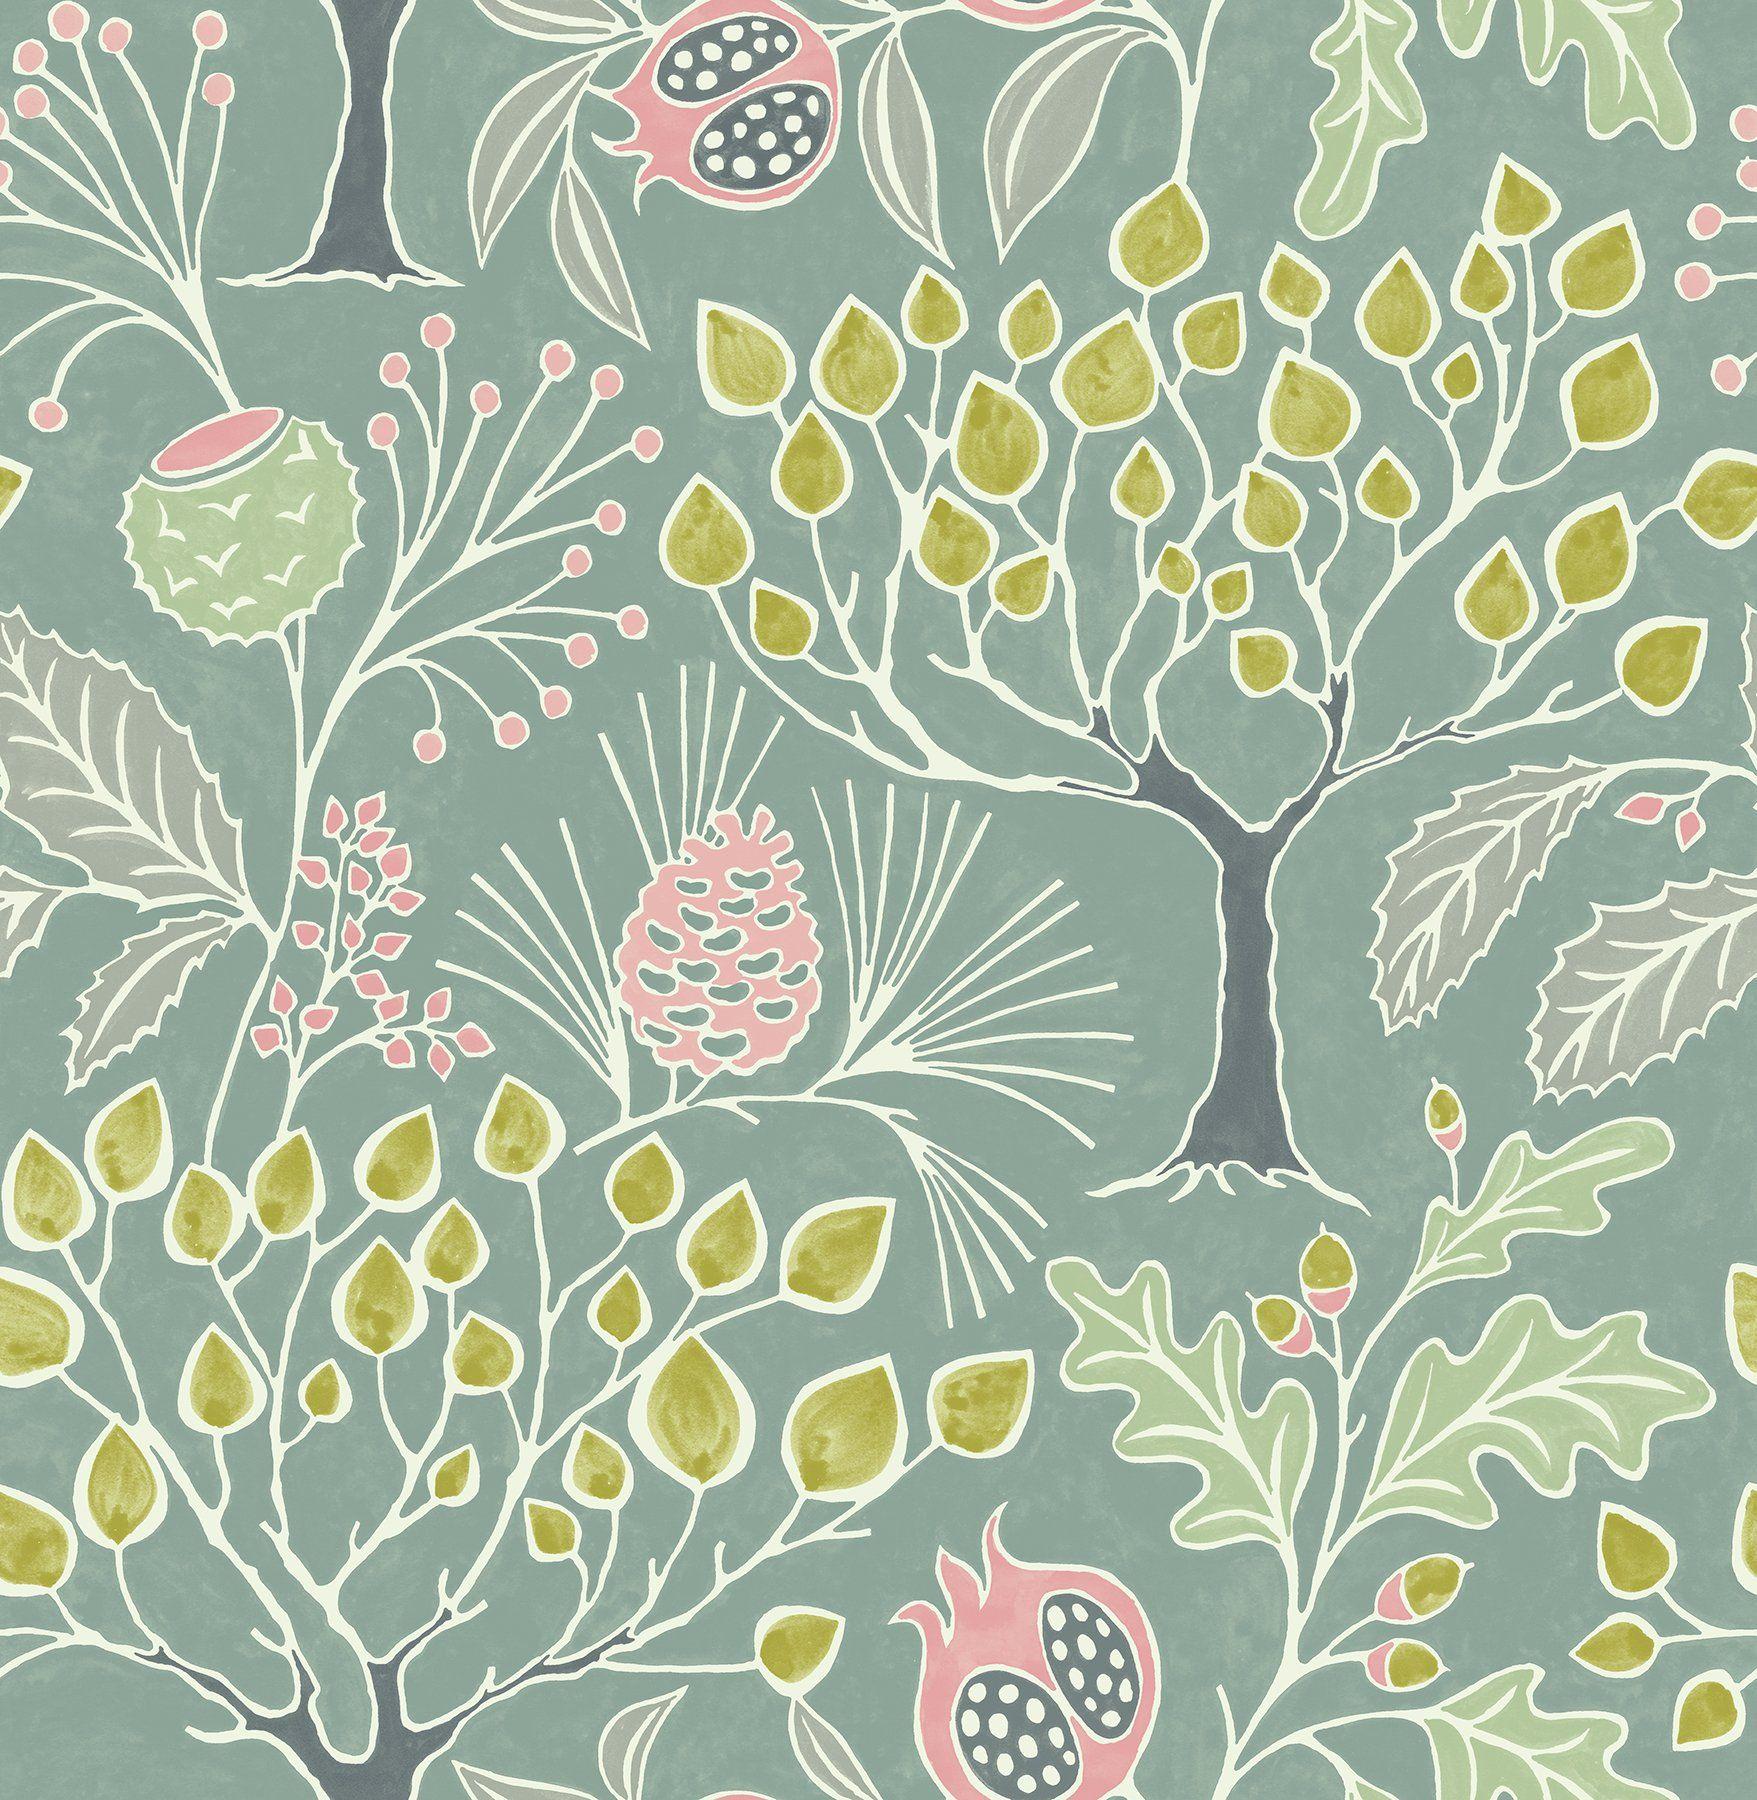 Shiloh Botanical Green Woodland Wallpaper Green Floral Wallpaper Botanical Wallpaper